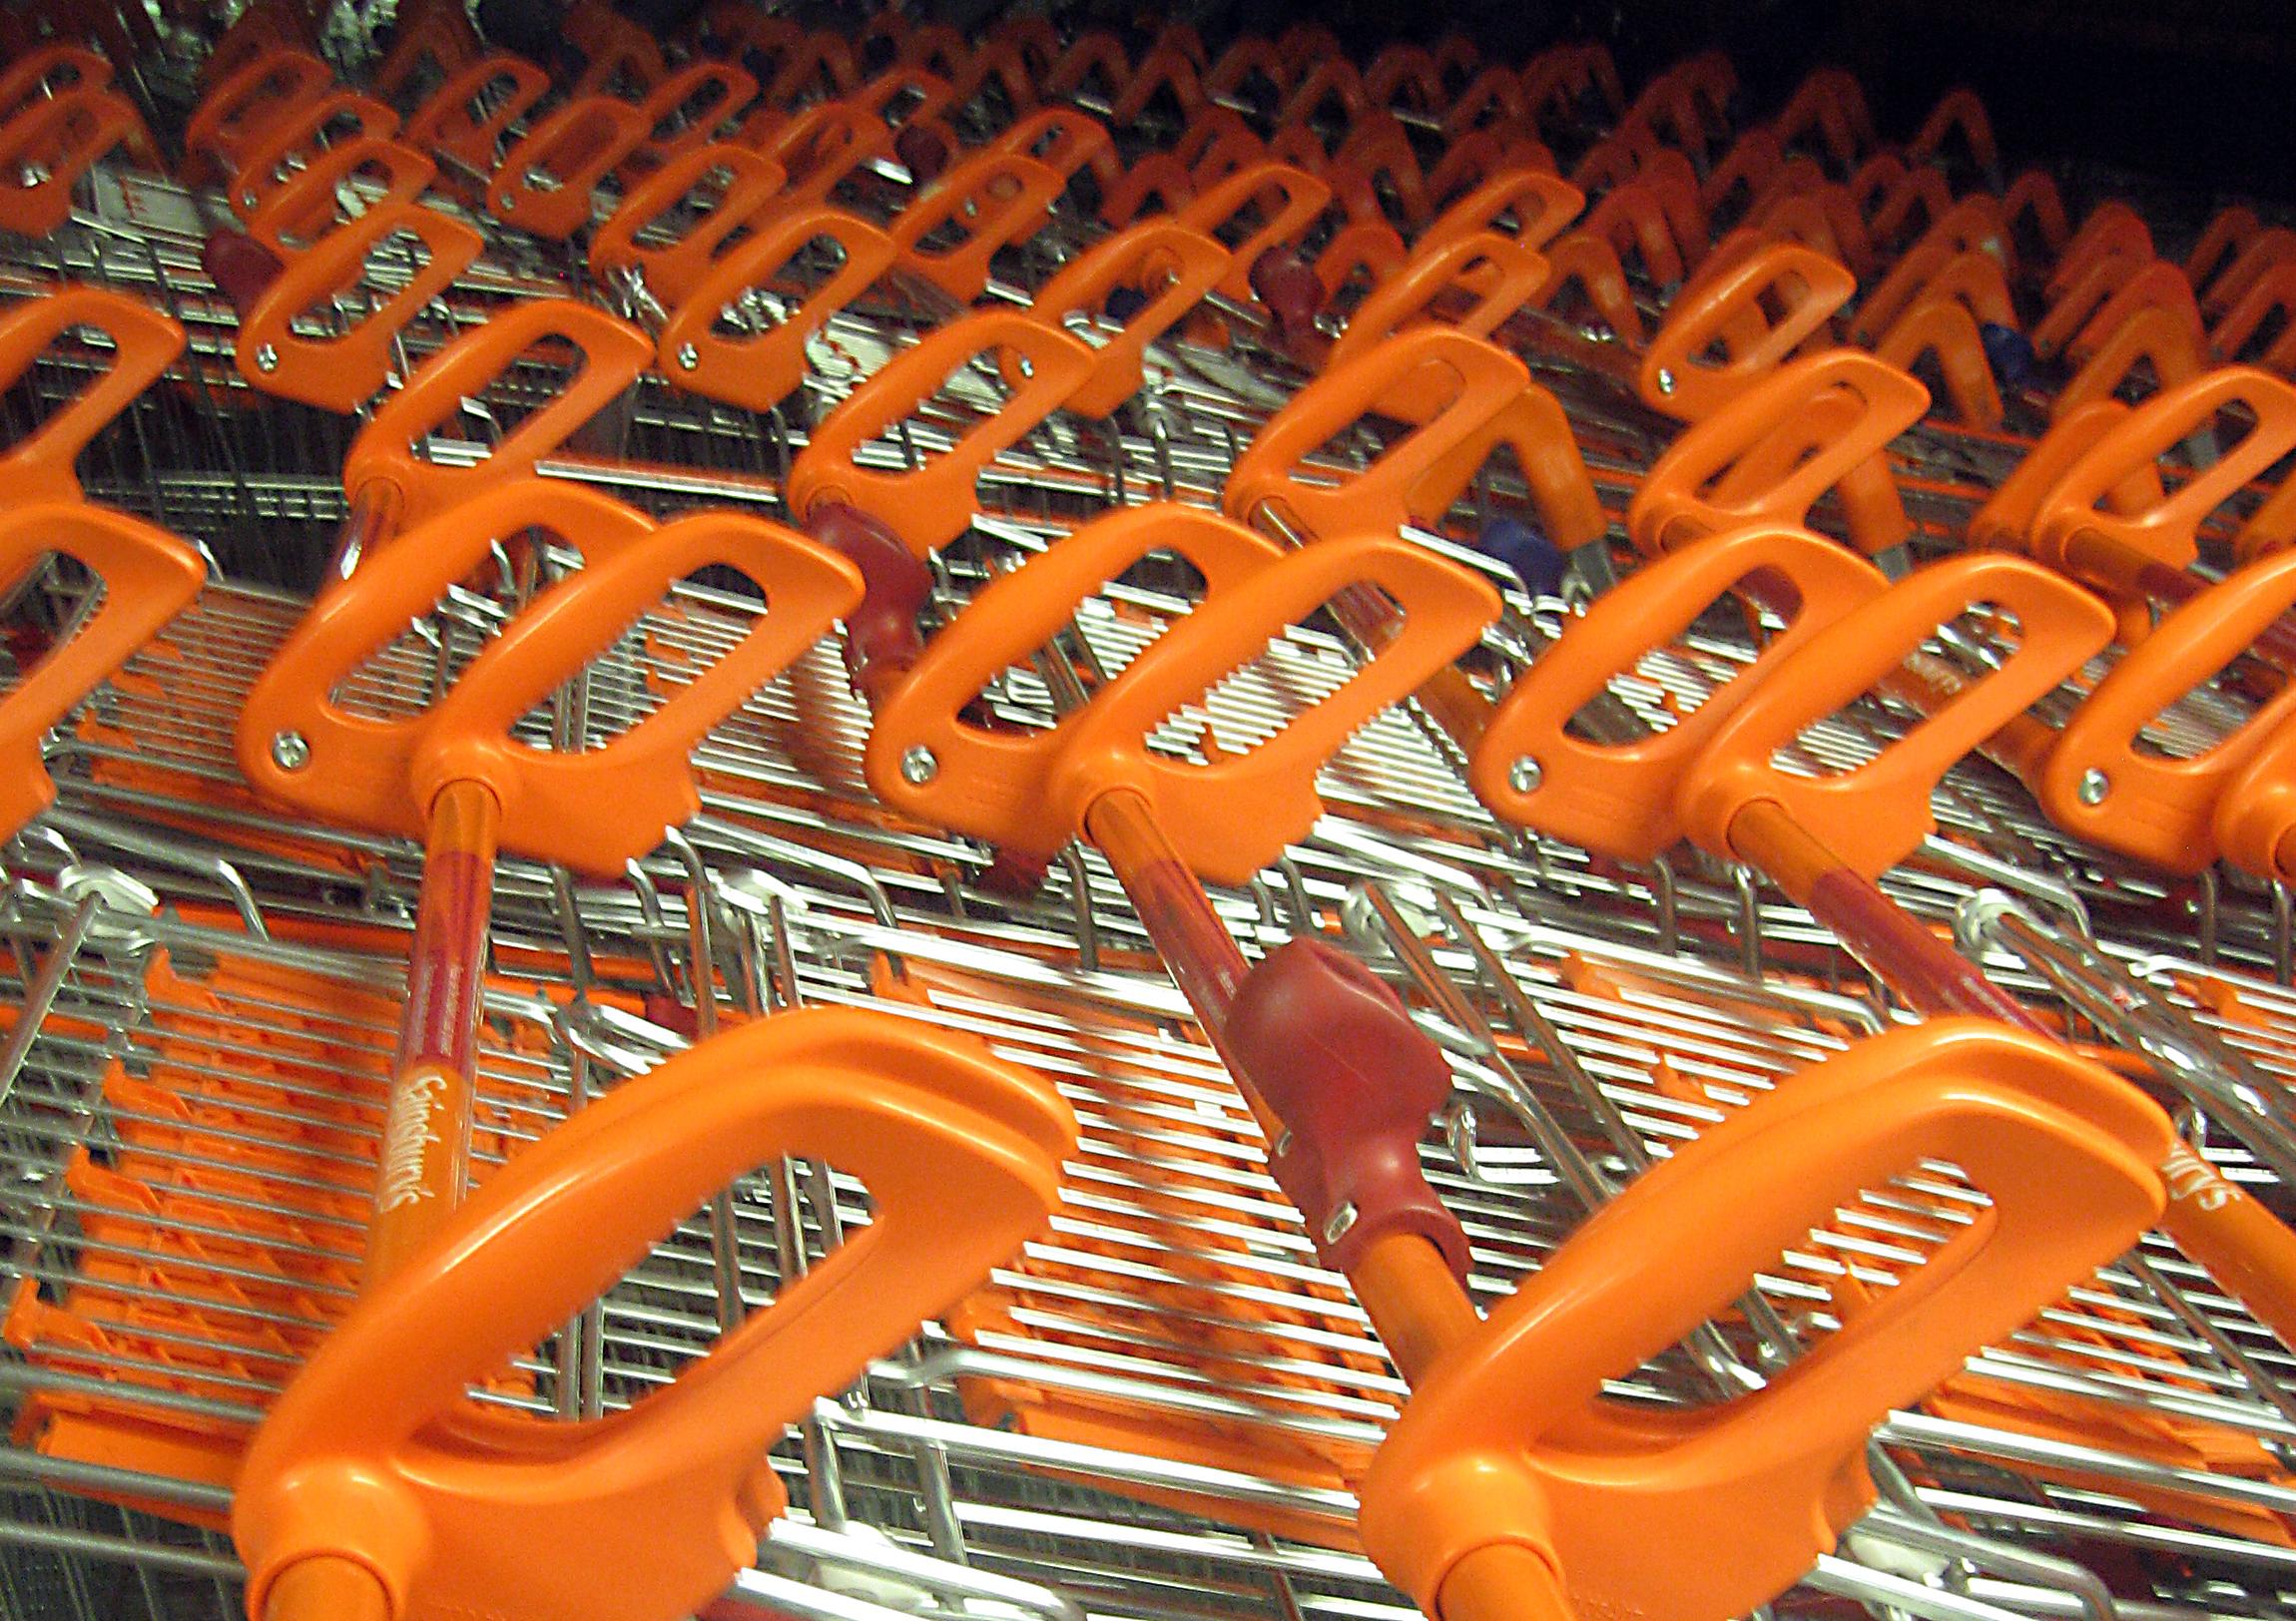 Trolleys in the supermarket